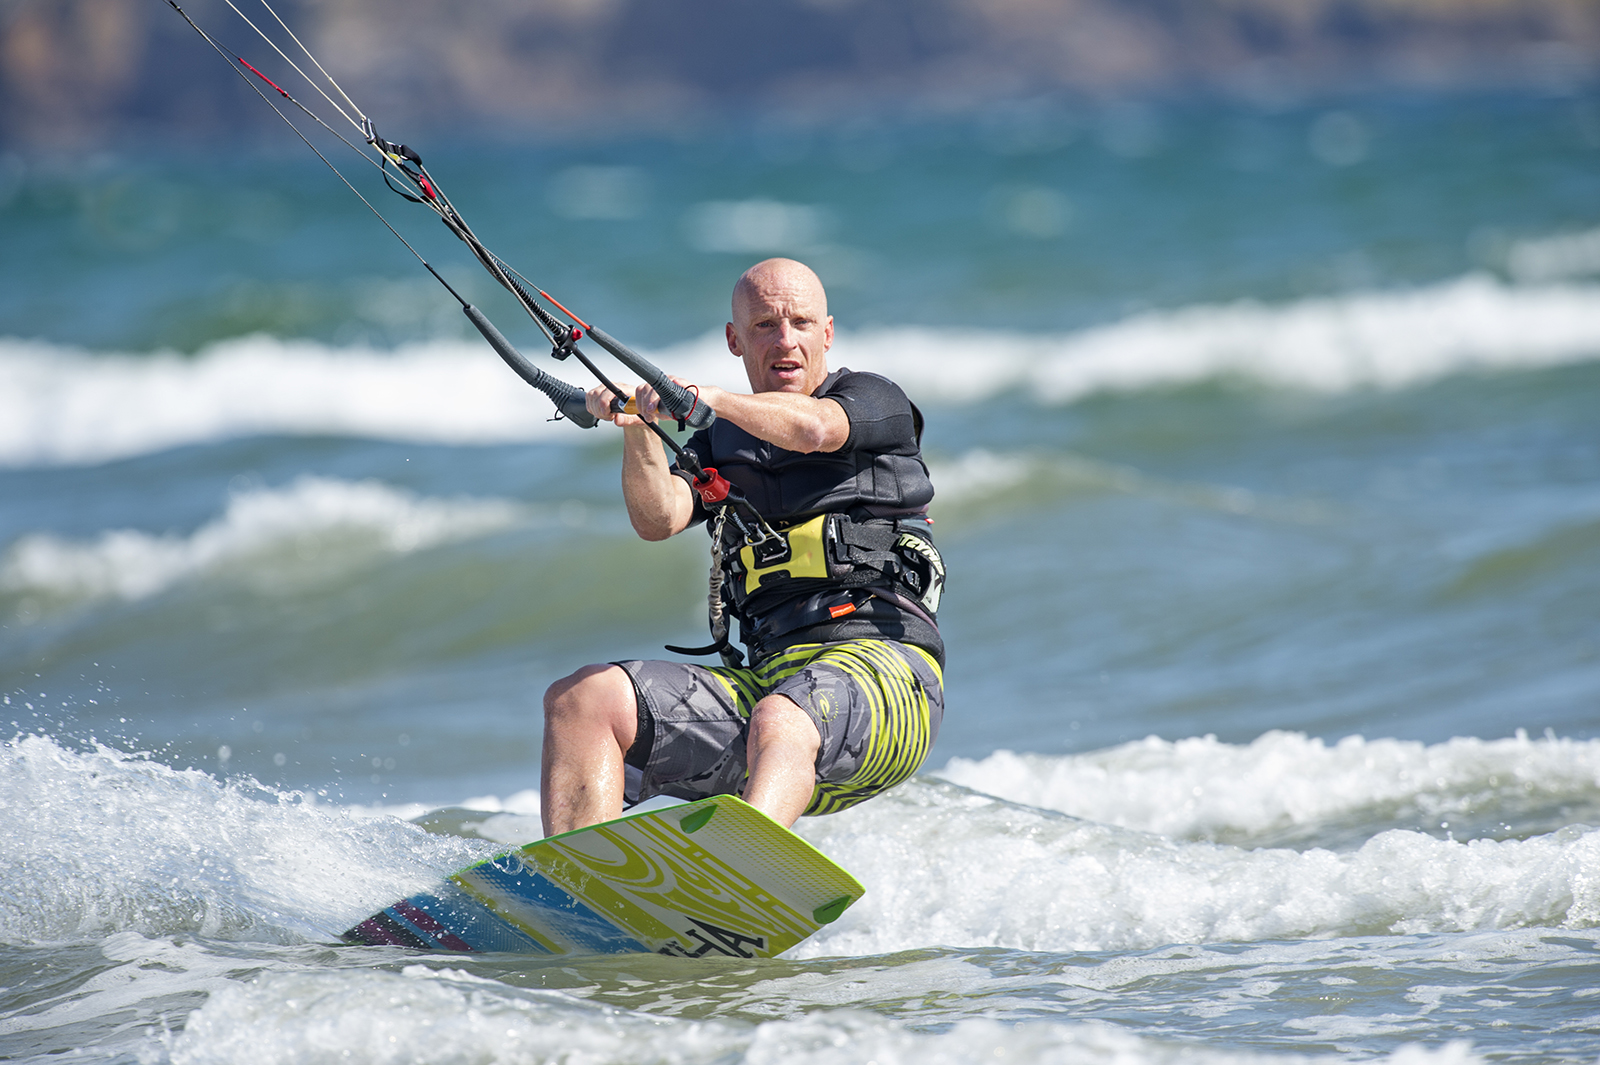 David Eales_Kite surfer_Silver